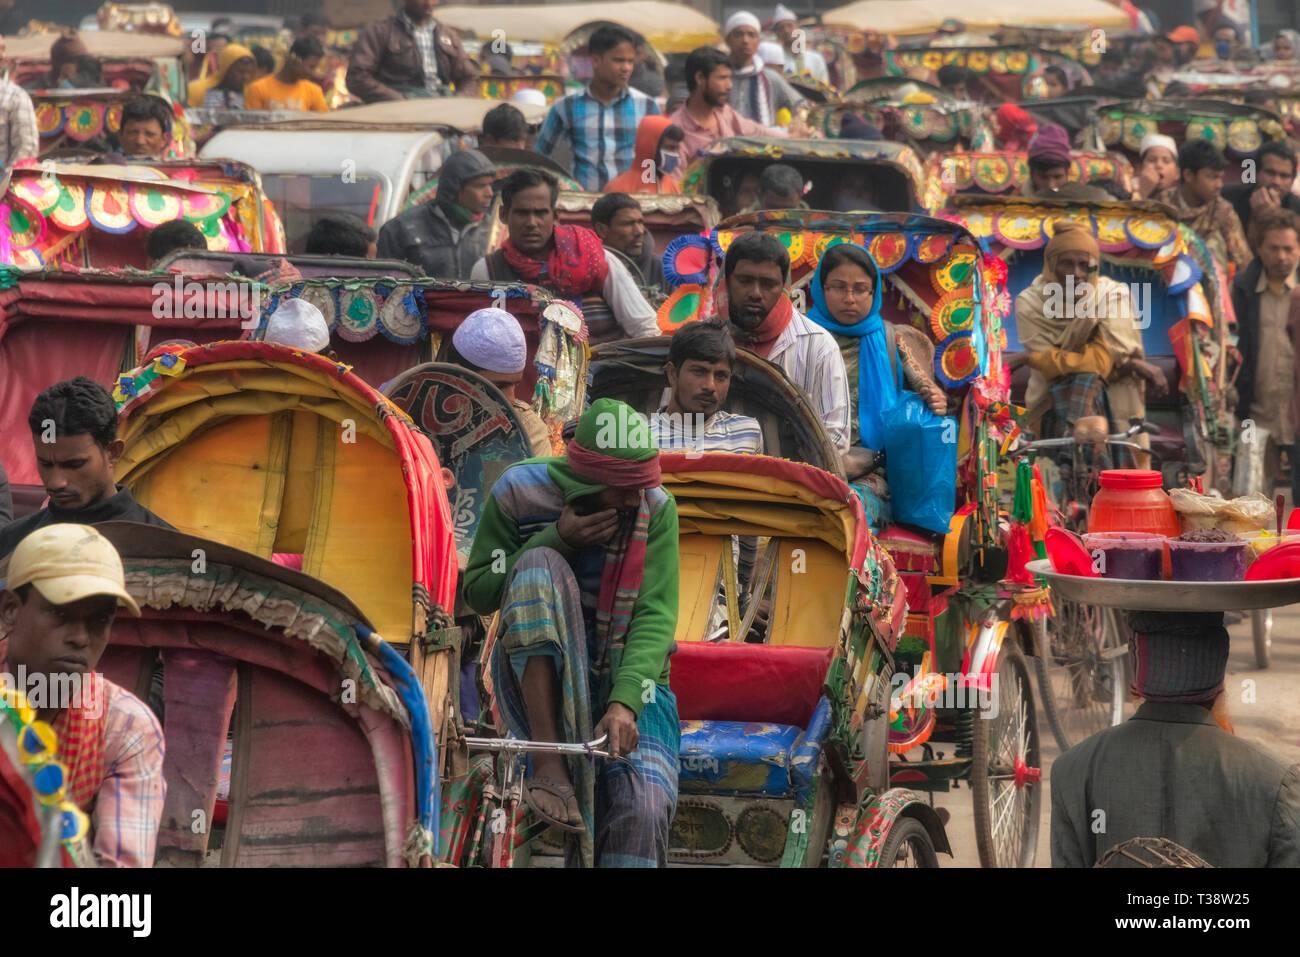 Rickshaws on the busy street, Dhaka, Bangladesh - Stock Image